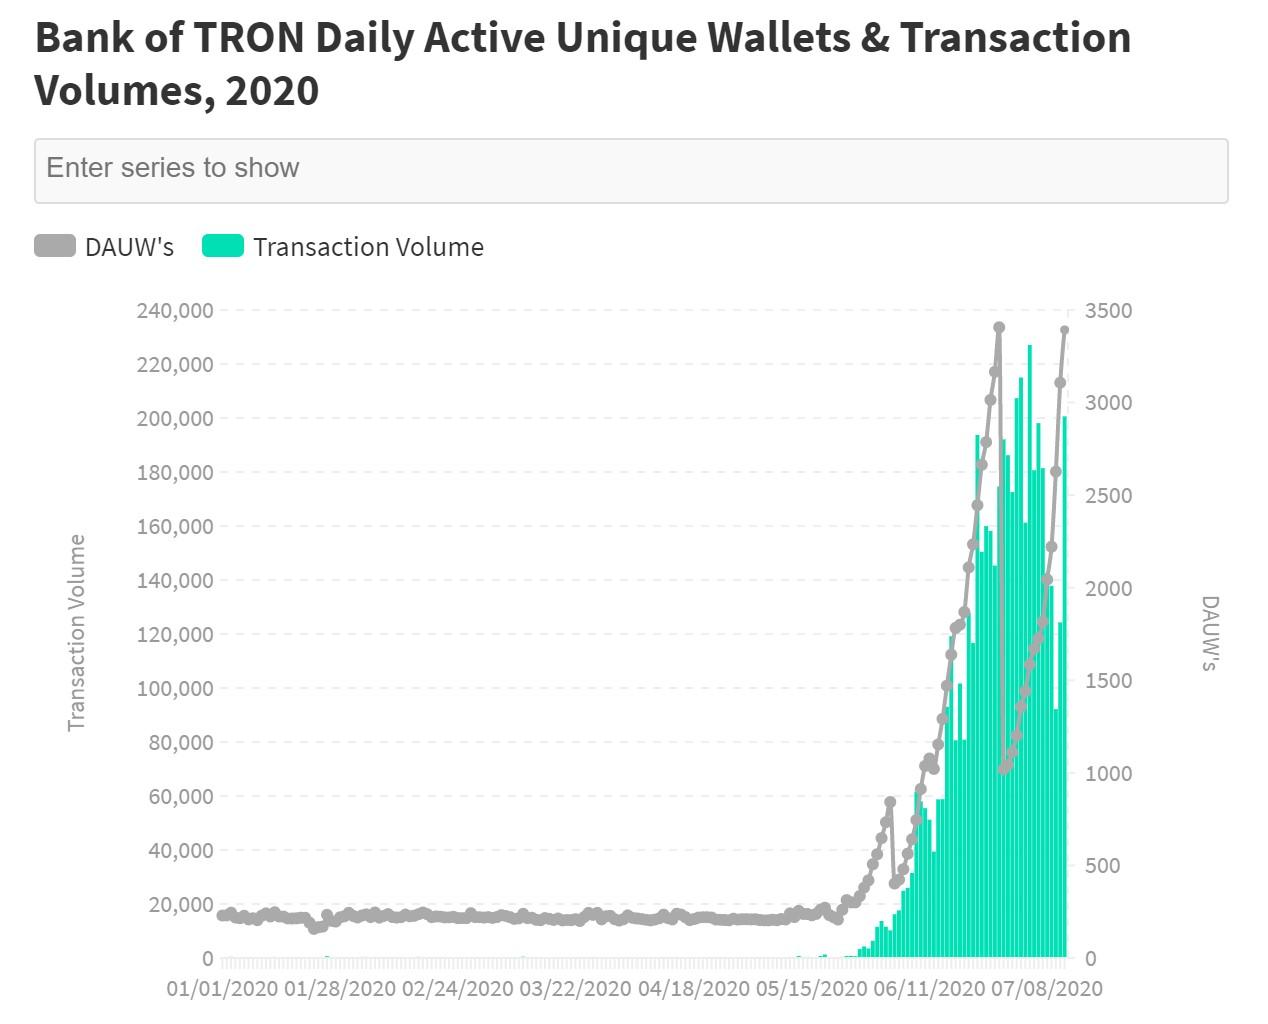 TRON银行每日活跃钱包总量与交易量分析图